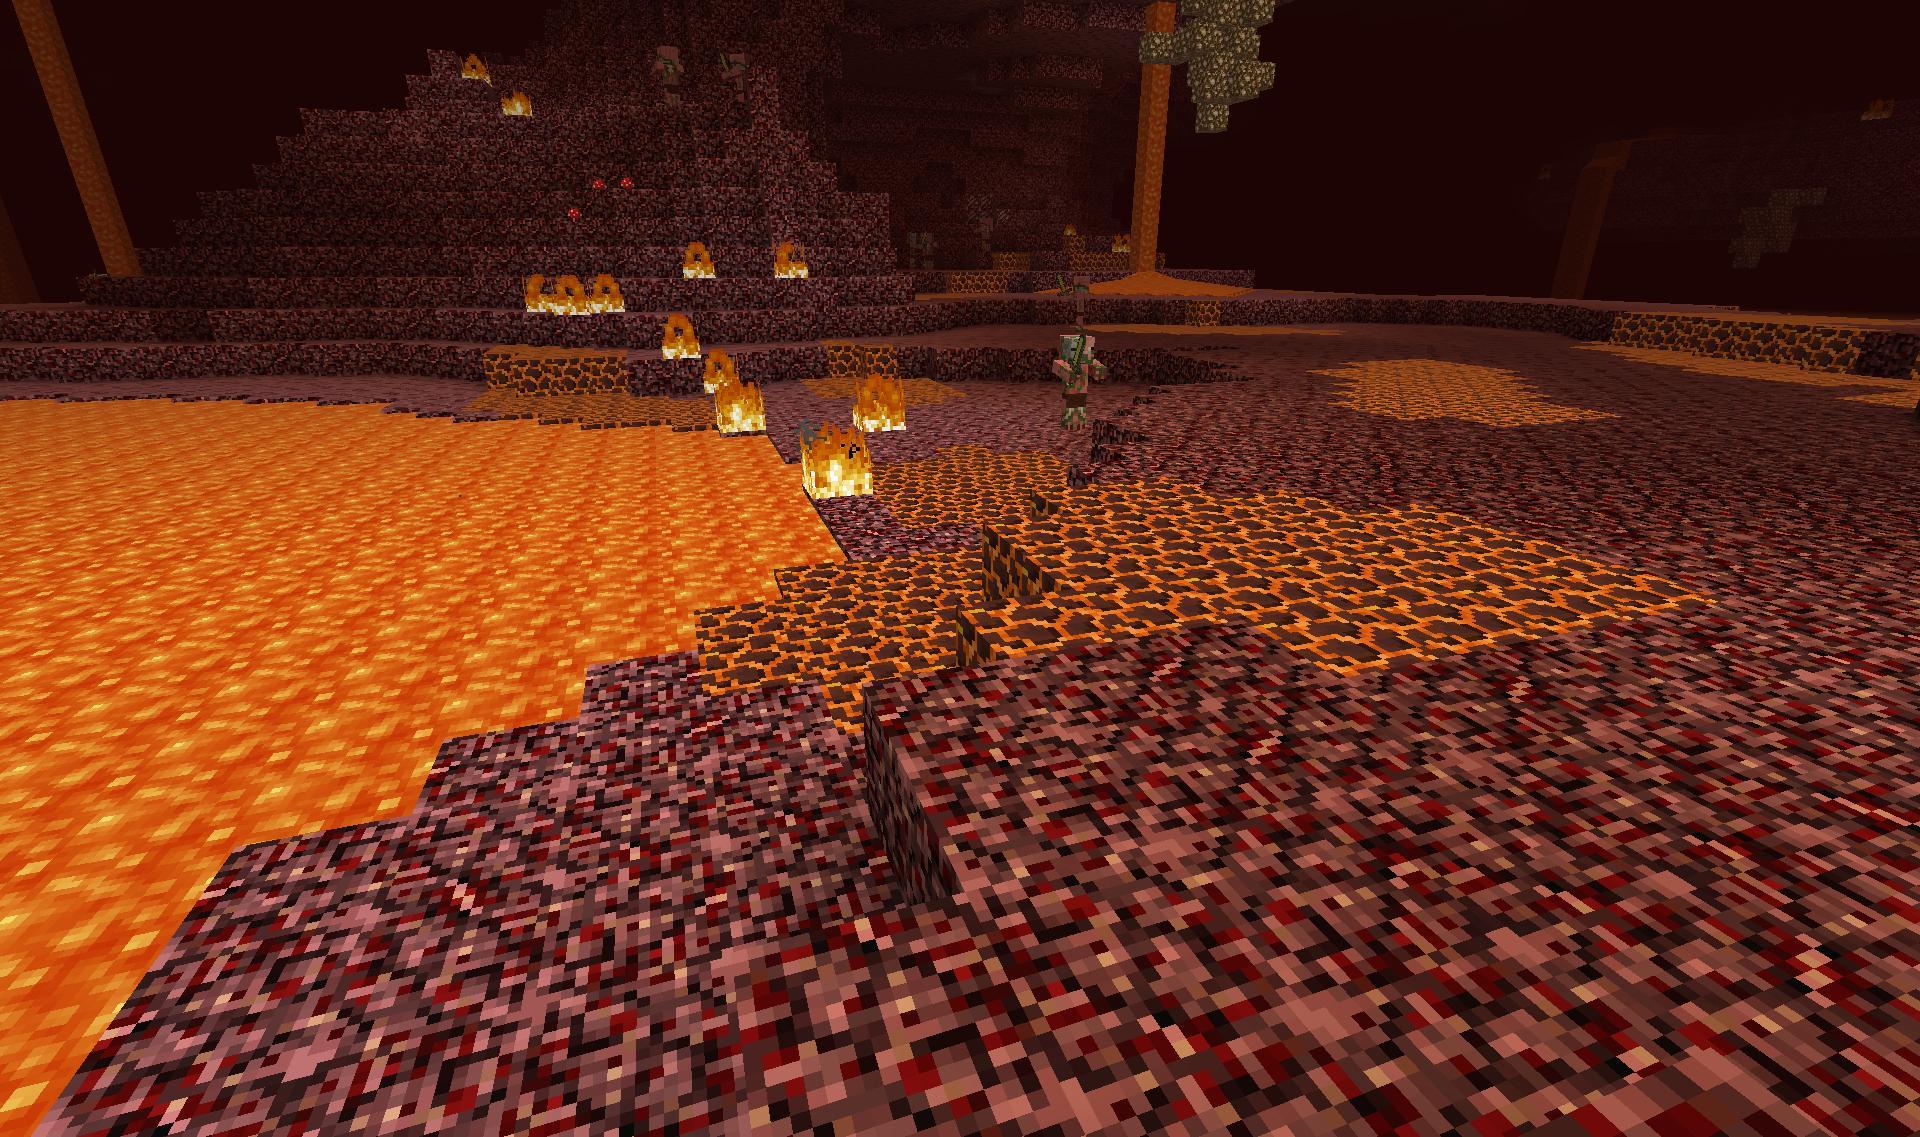 Bloque de magma | Minecraftpedia | FANDOM powered by Wikia